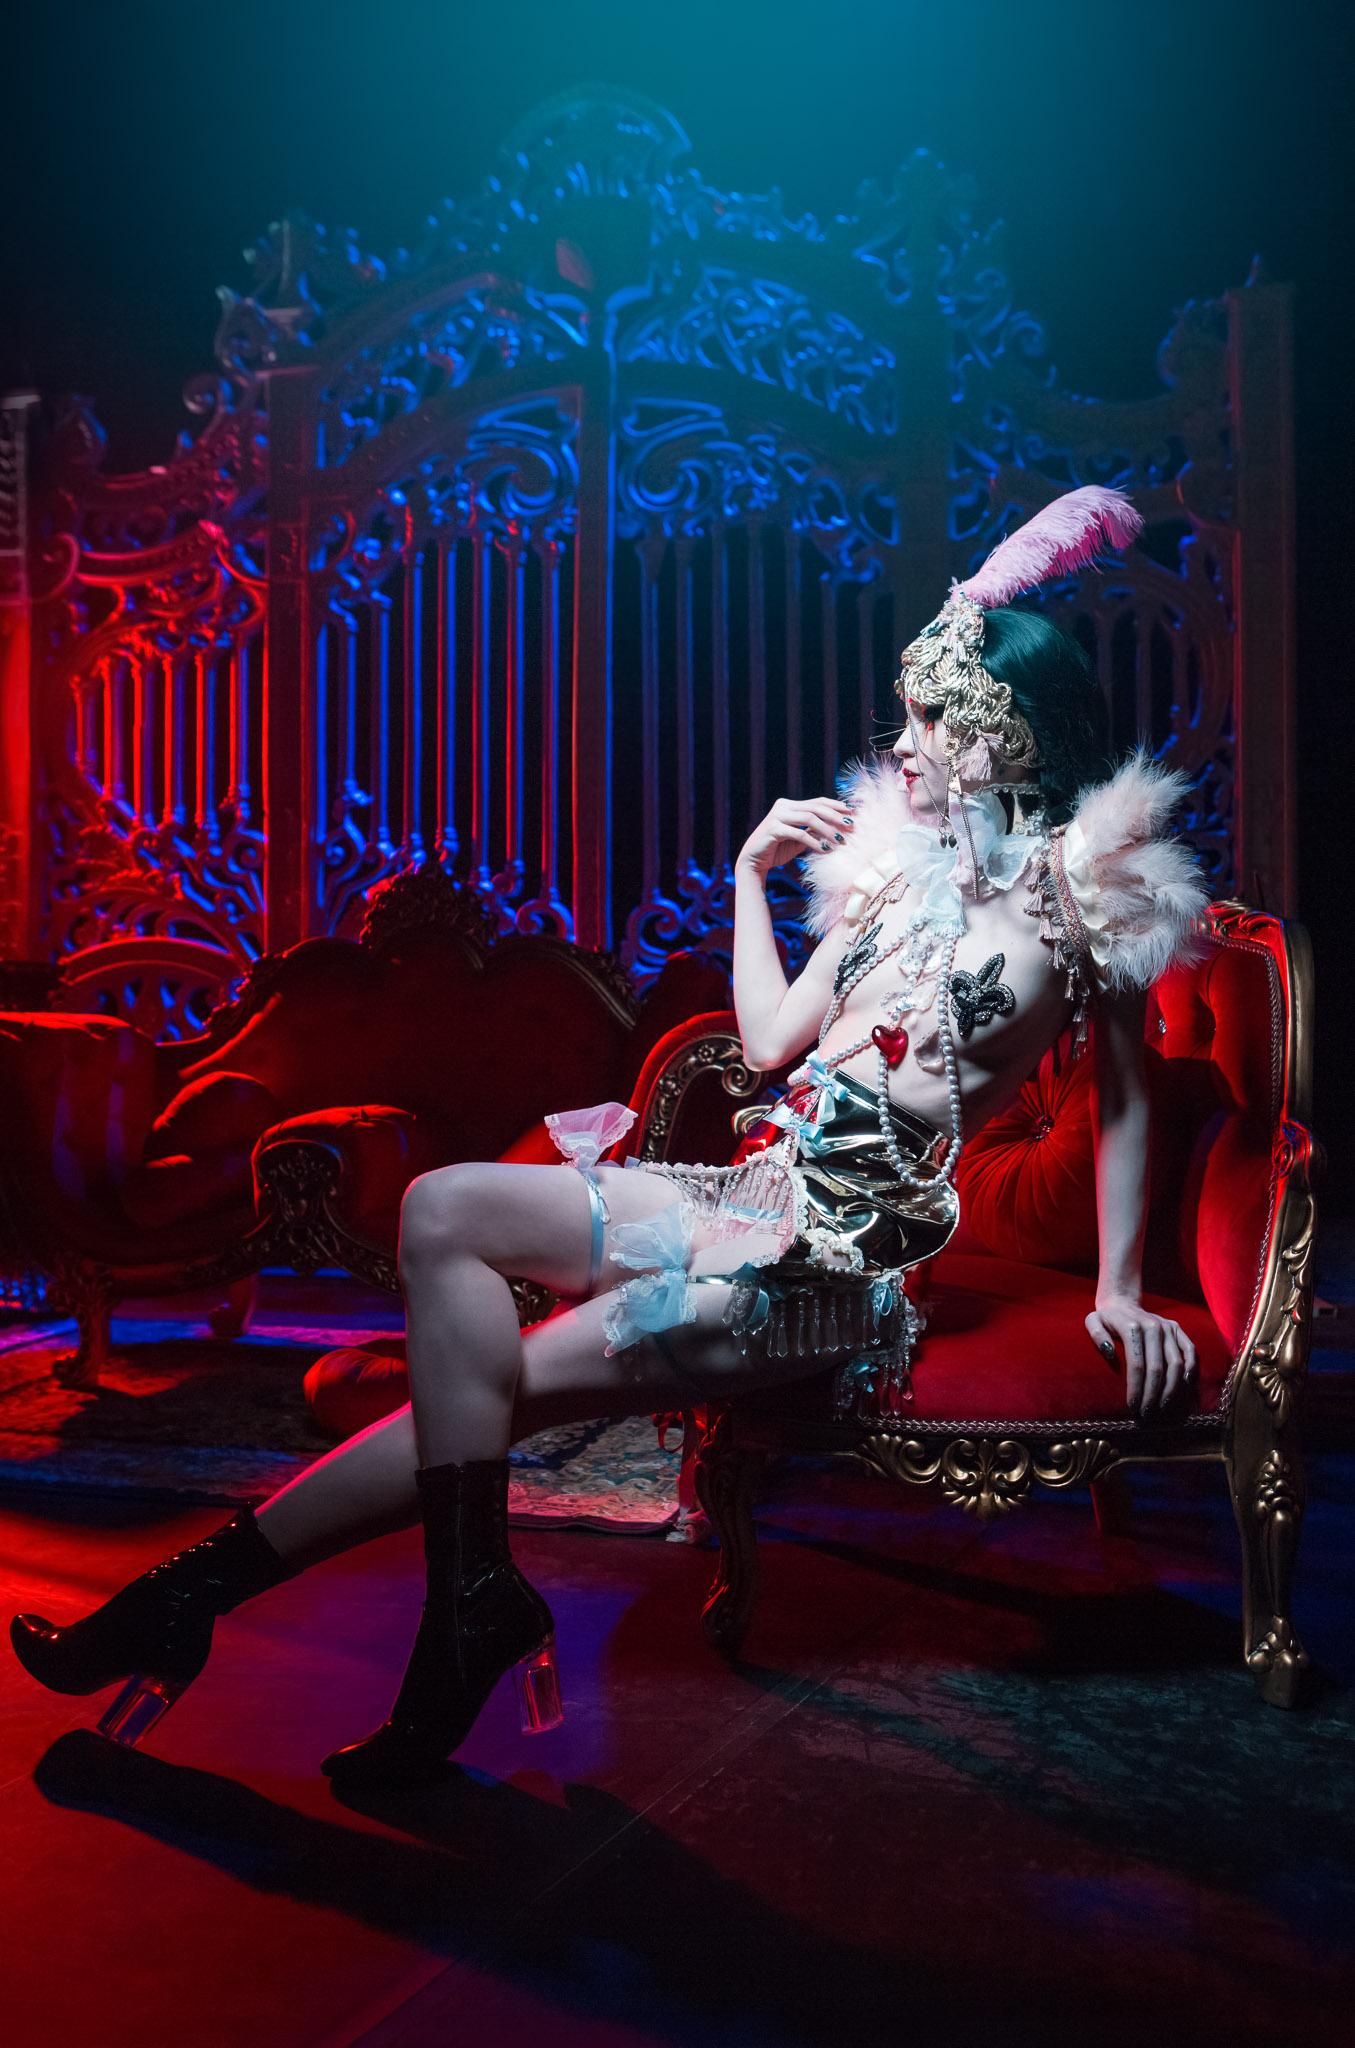 Maison-Chardon-shayne-gray-fashion-shoot-extravaganza-5462.jpg